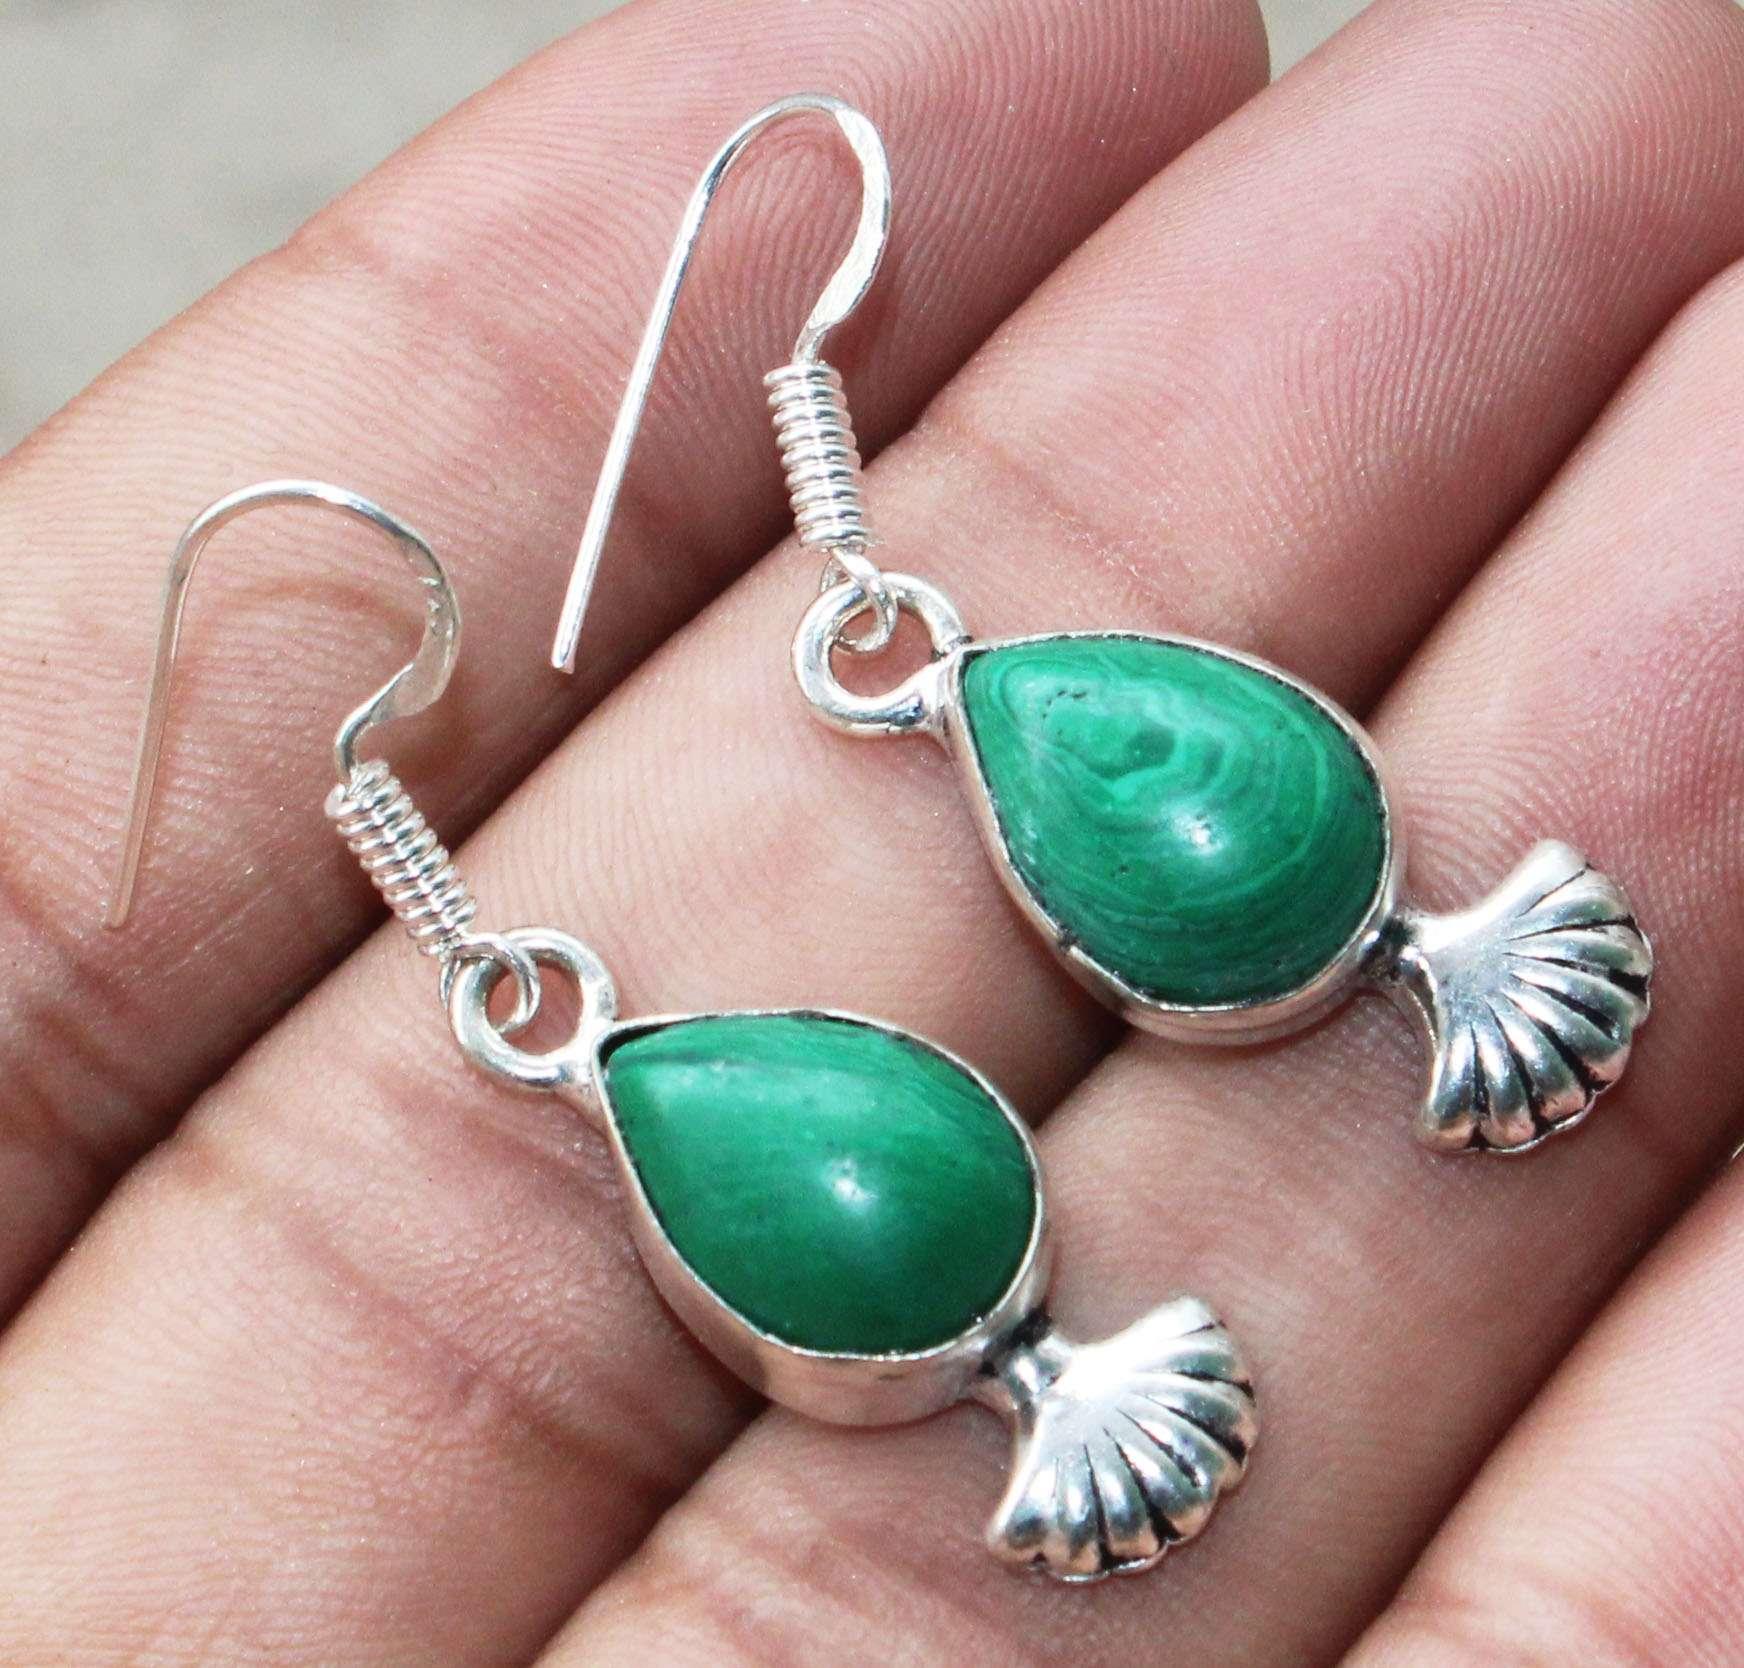 ae3713 925 Sterling Silver Handmade Designer Charm Stud Earring Jewelry Amazing Malachite Round Shape Gemstone Solid Stud Earring